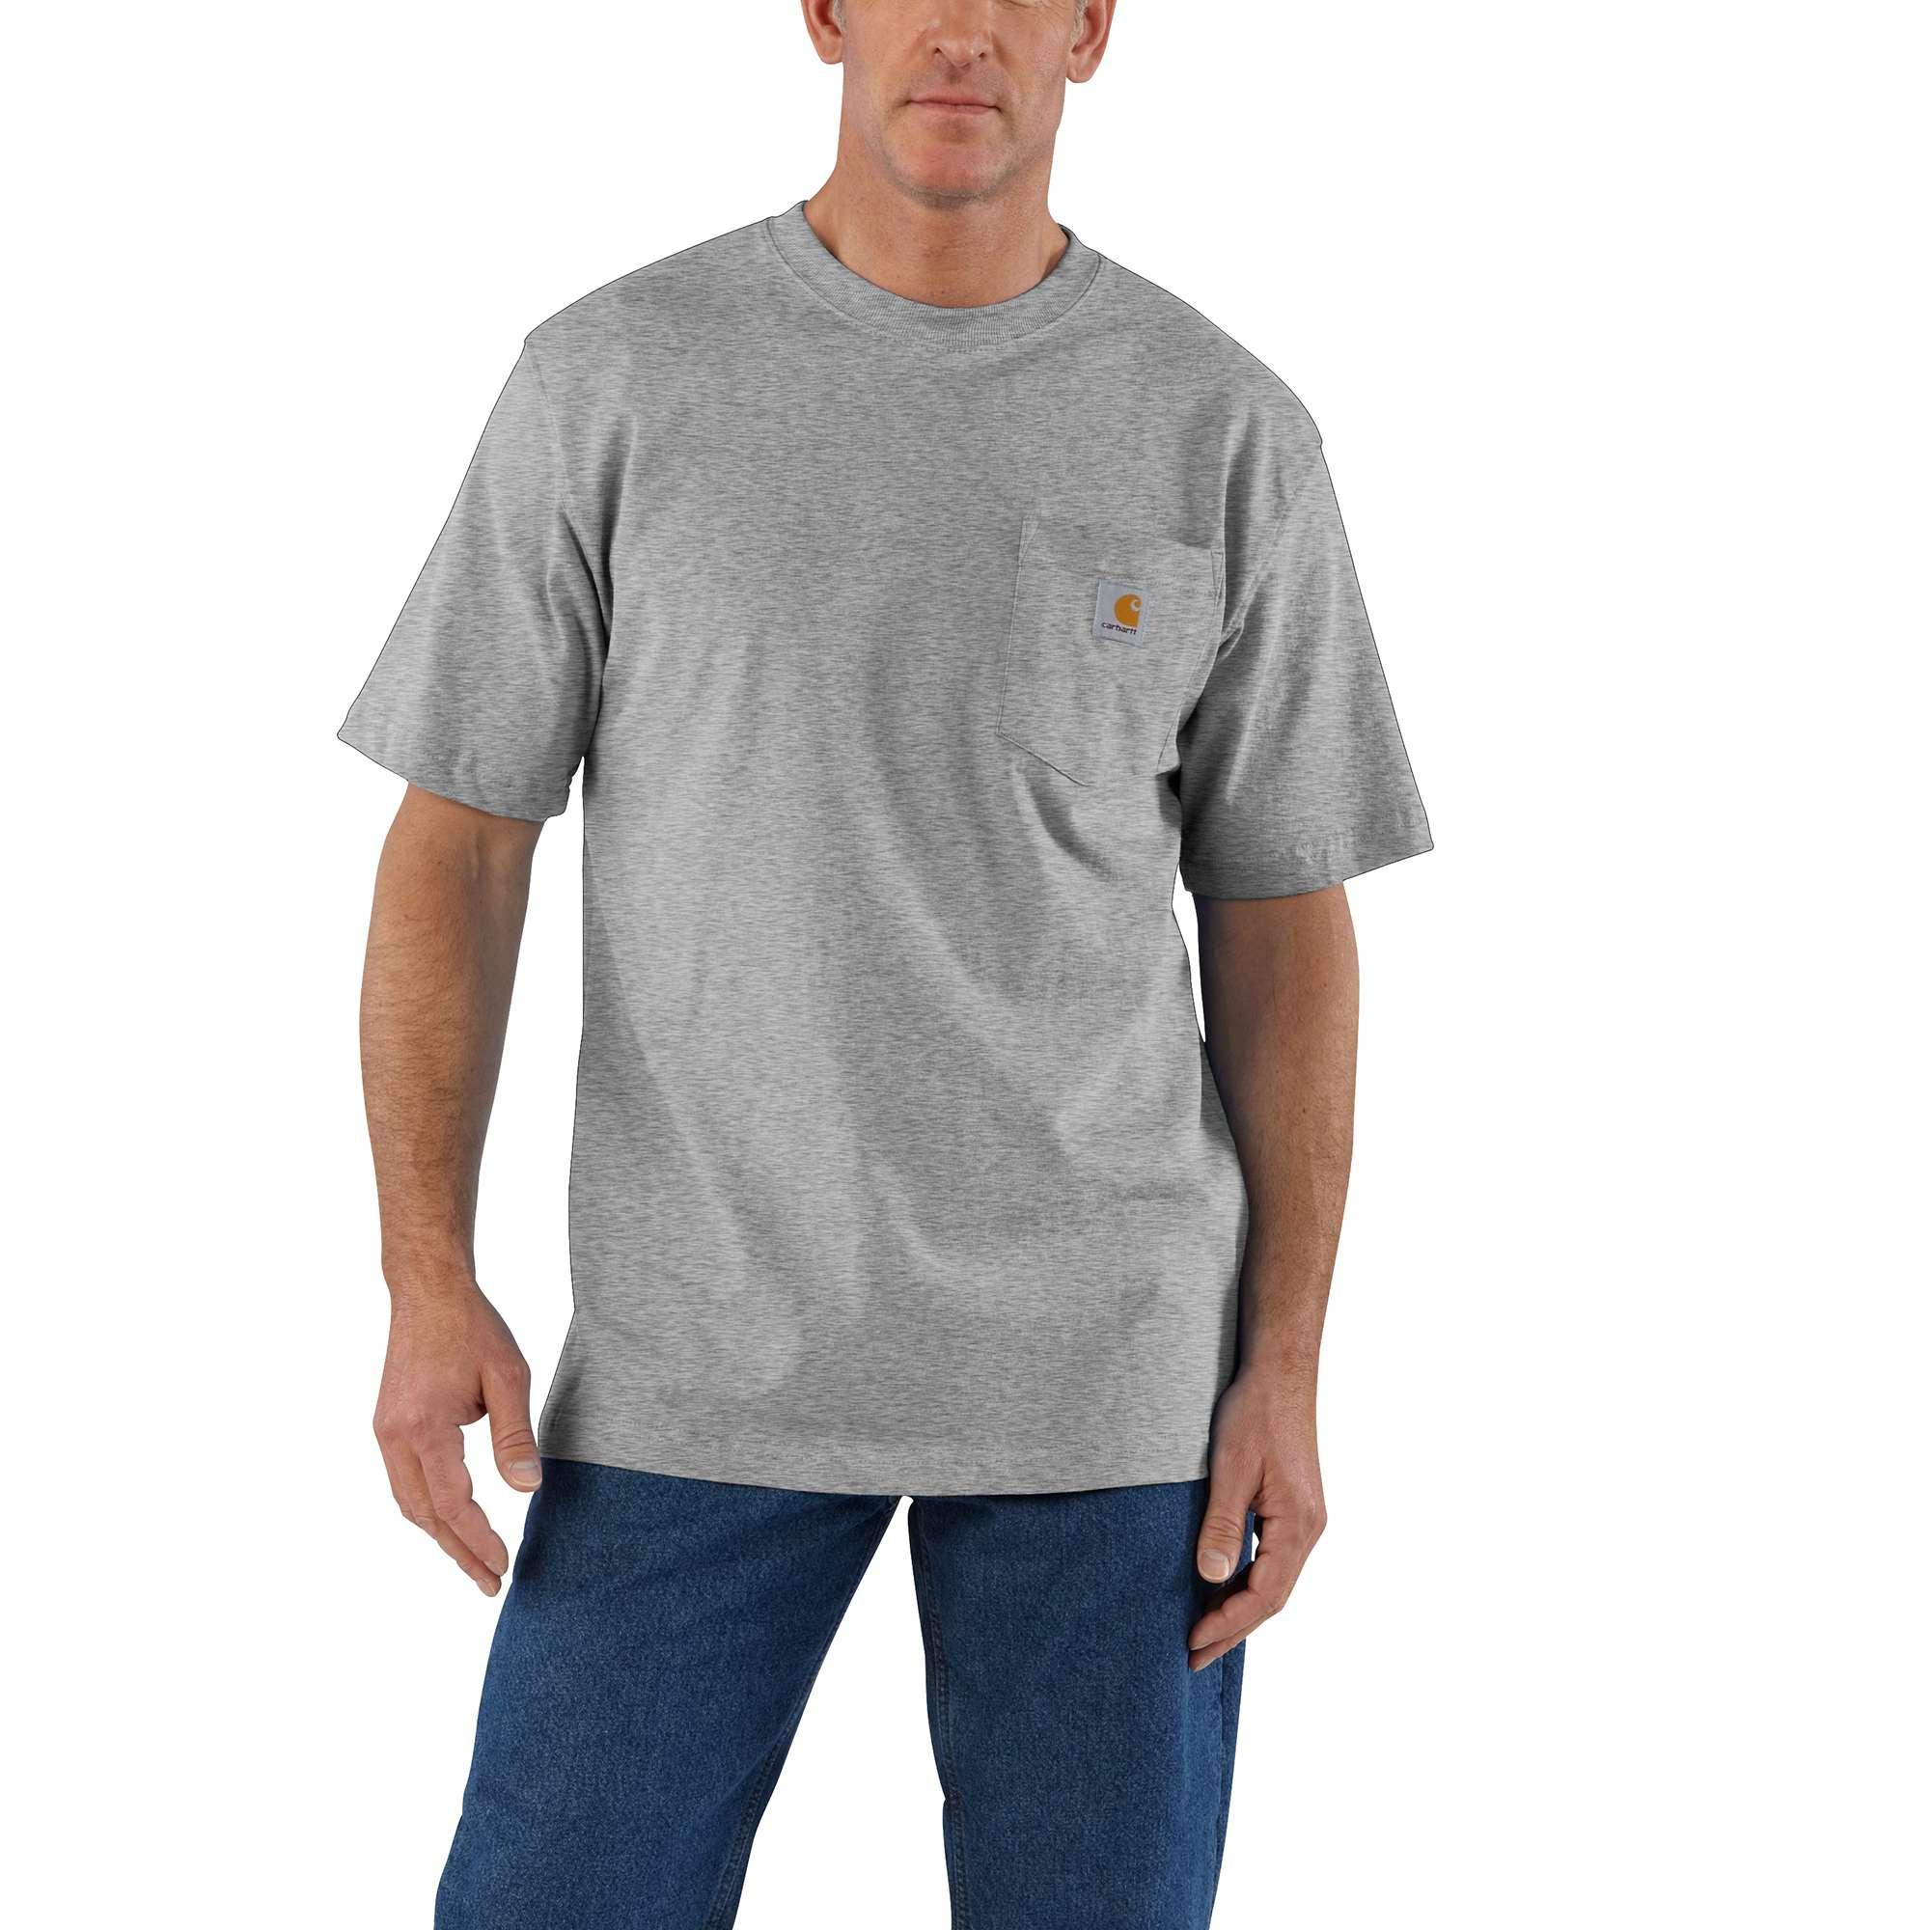 Men's Workwear Pocket Tee, Granite, swatch